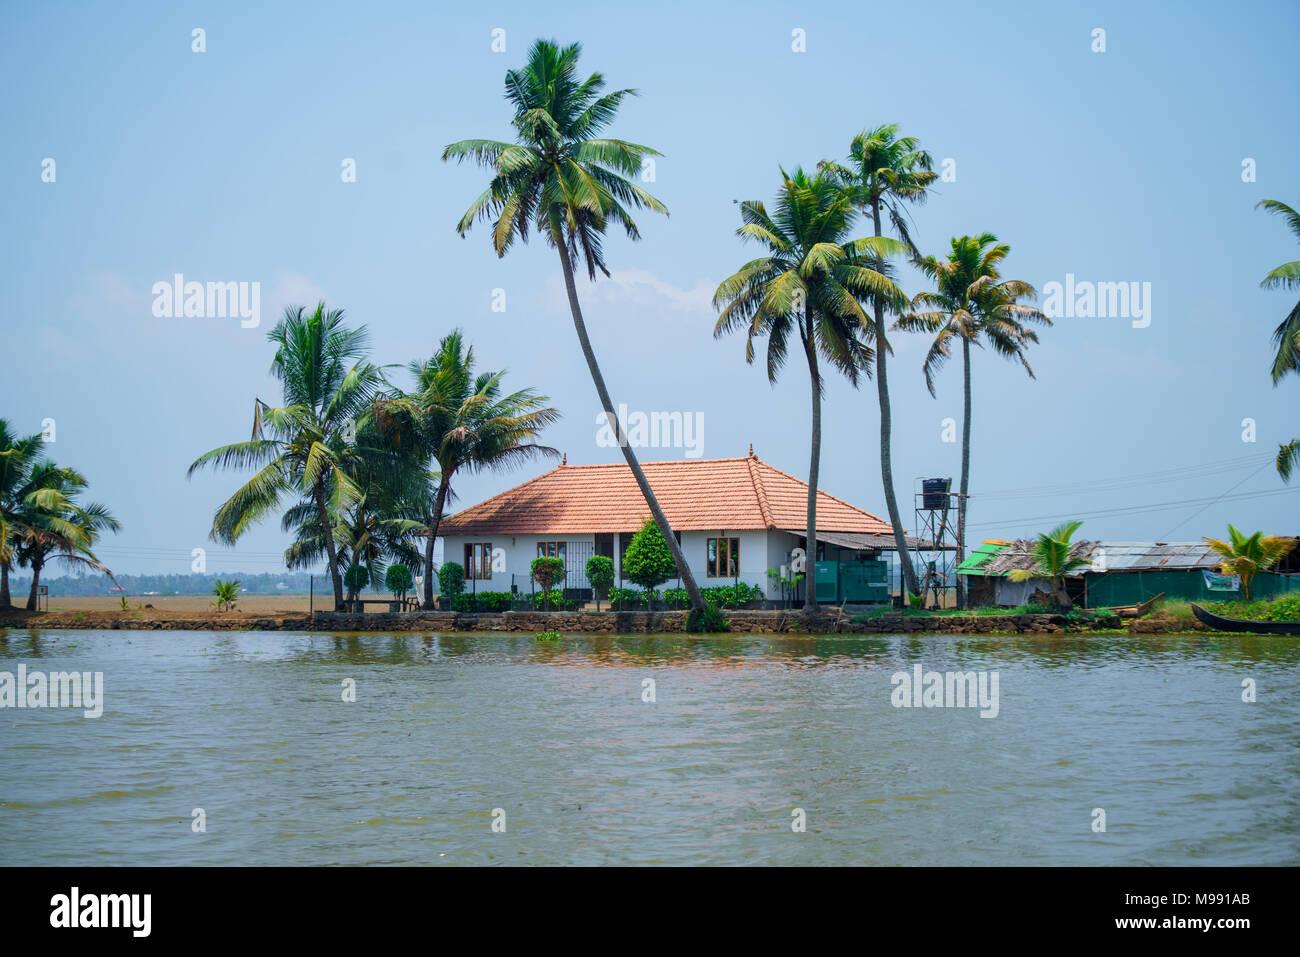 Village house Village india - Stock Image